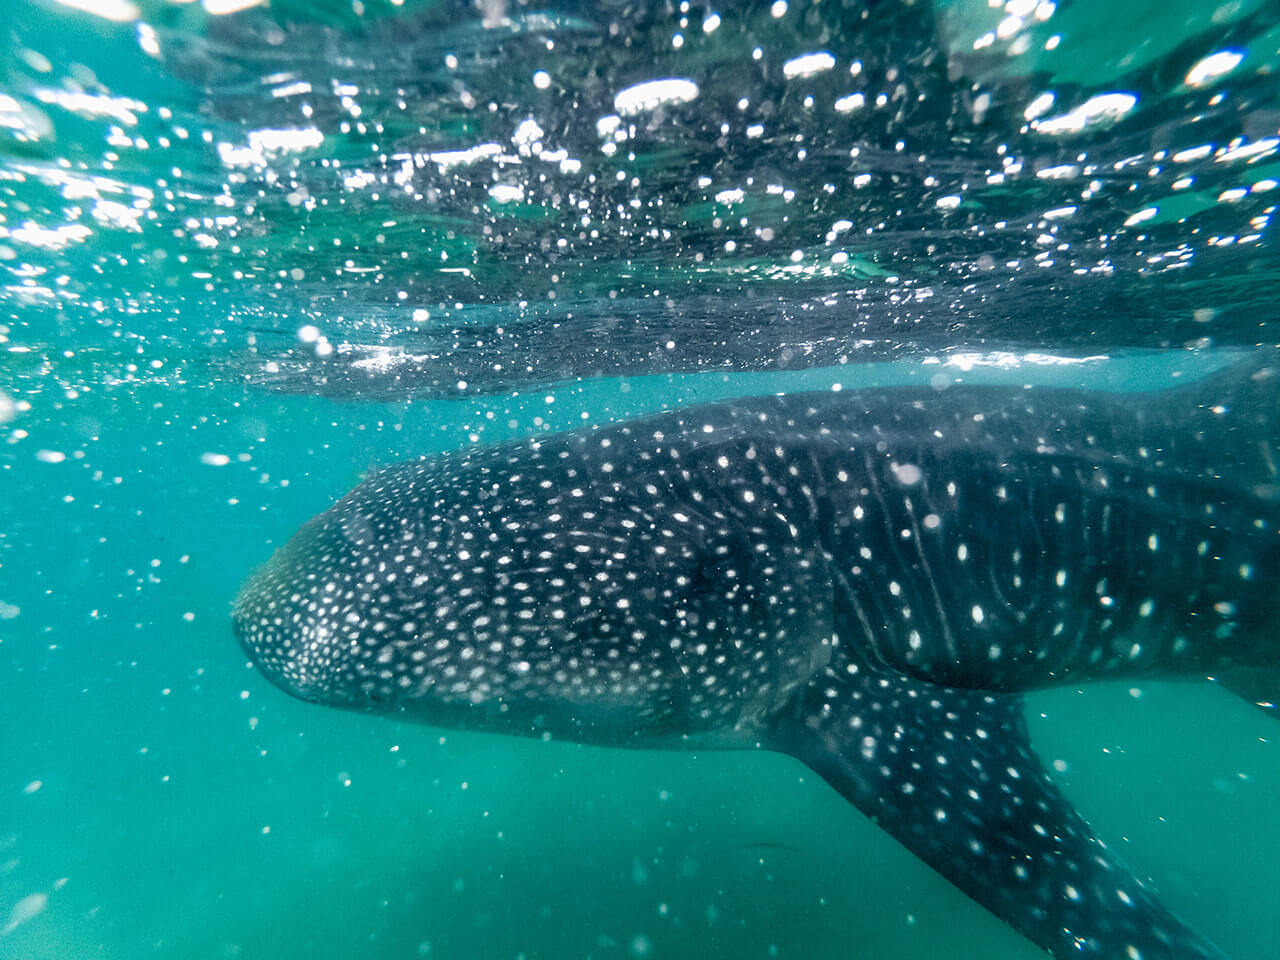 whale-shark-03.jpg